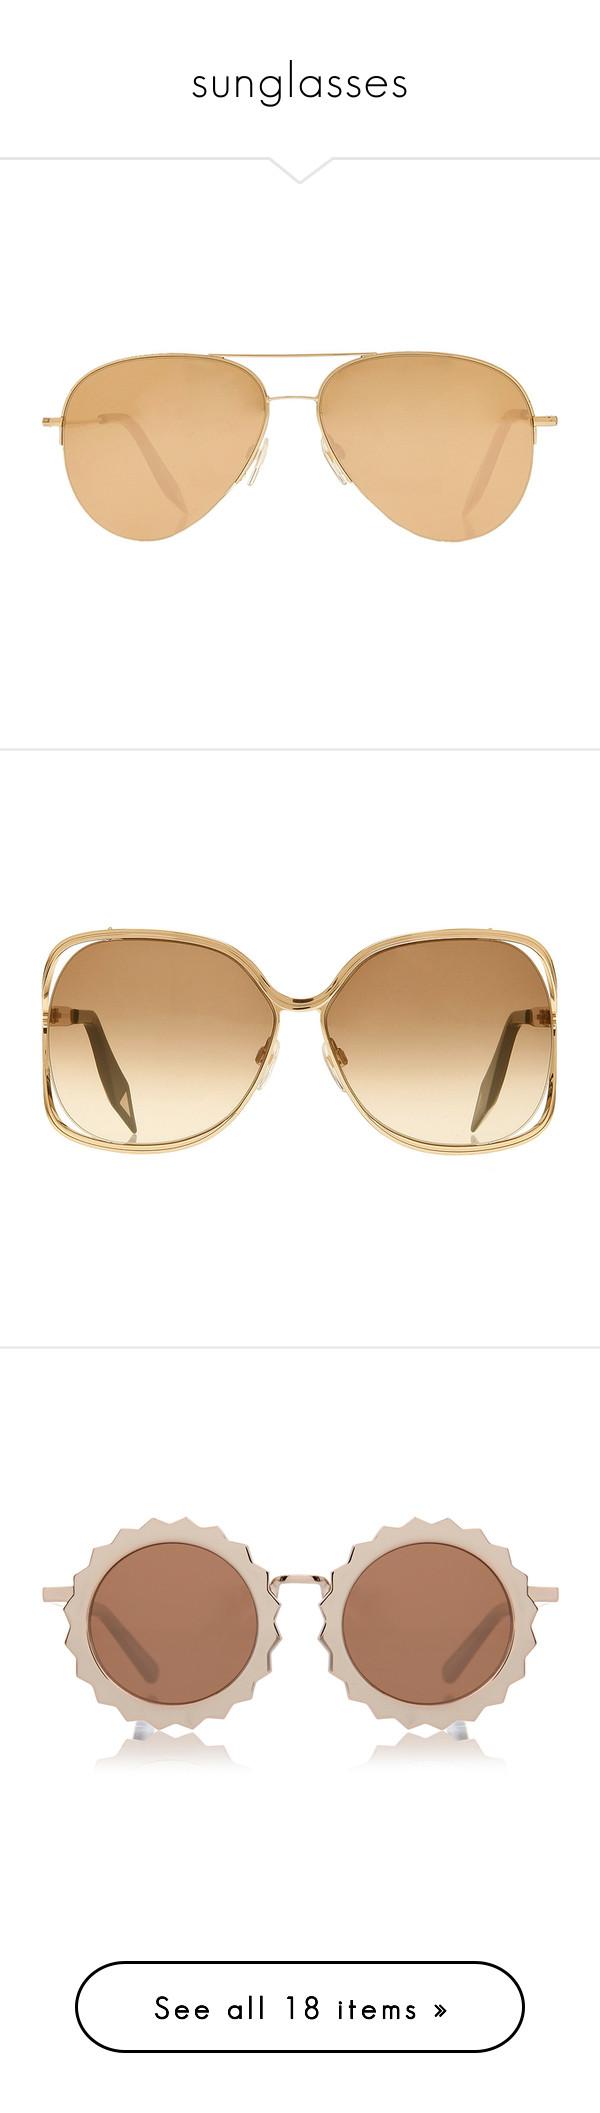 cbb35d57515 Pink Sunglasses Polyvore - Shabooms